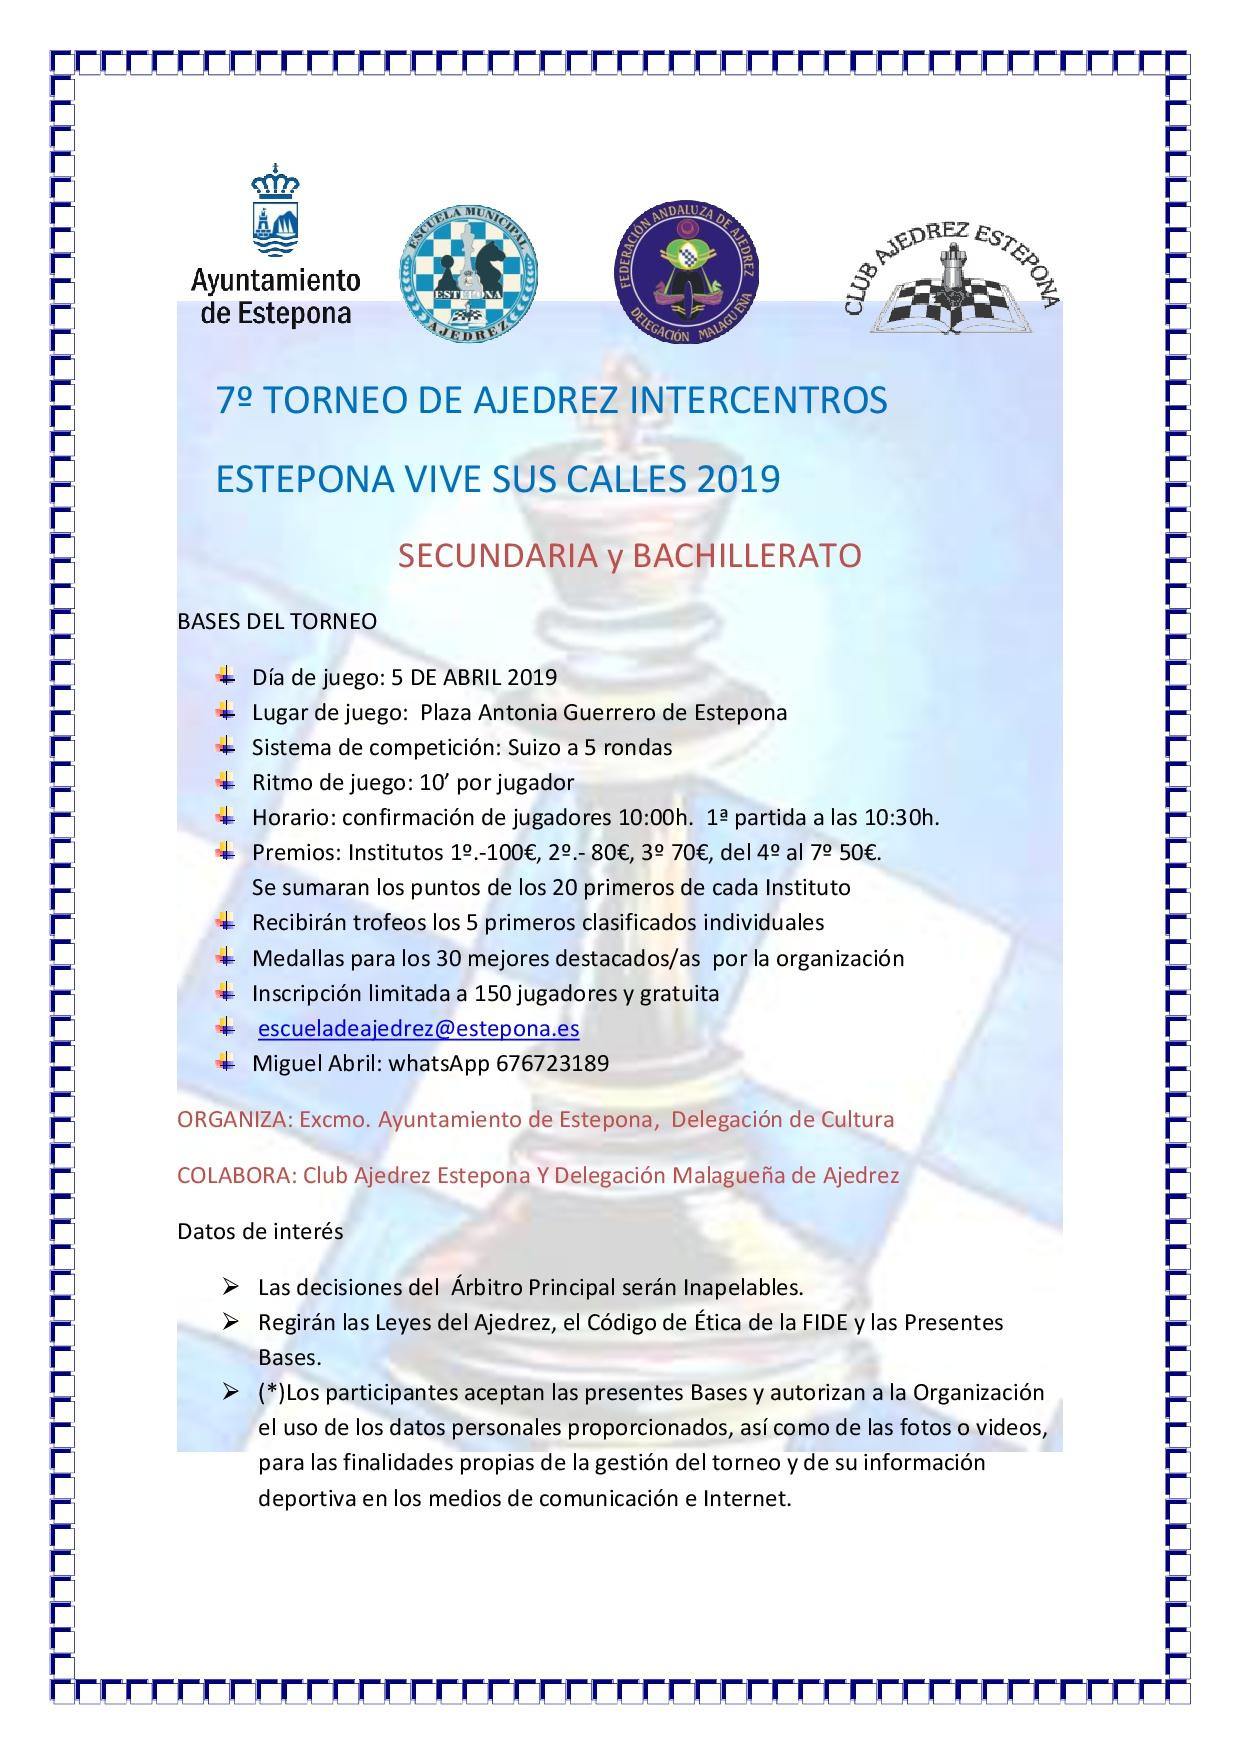 7º TORNEO DE AJEDREZ INTERCENTROS 2019 nuevo